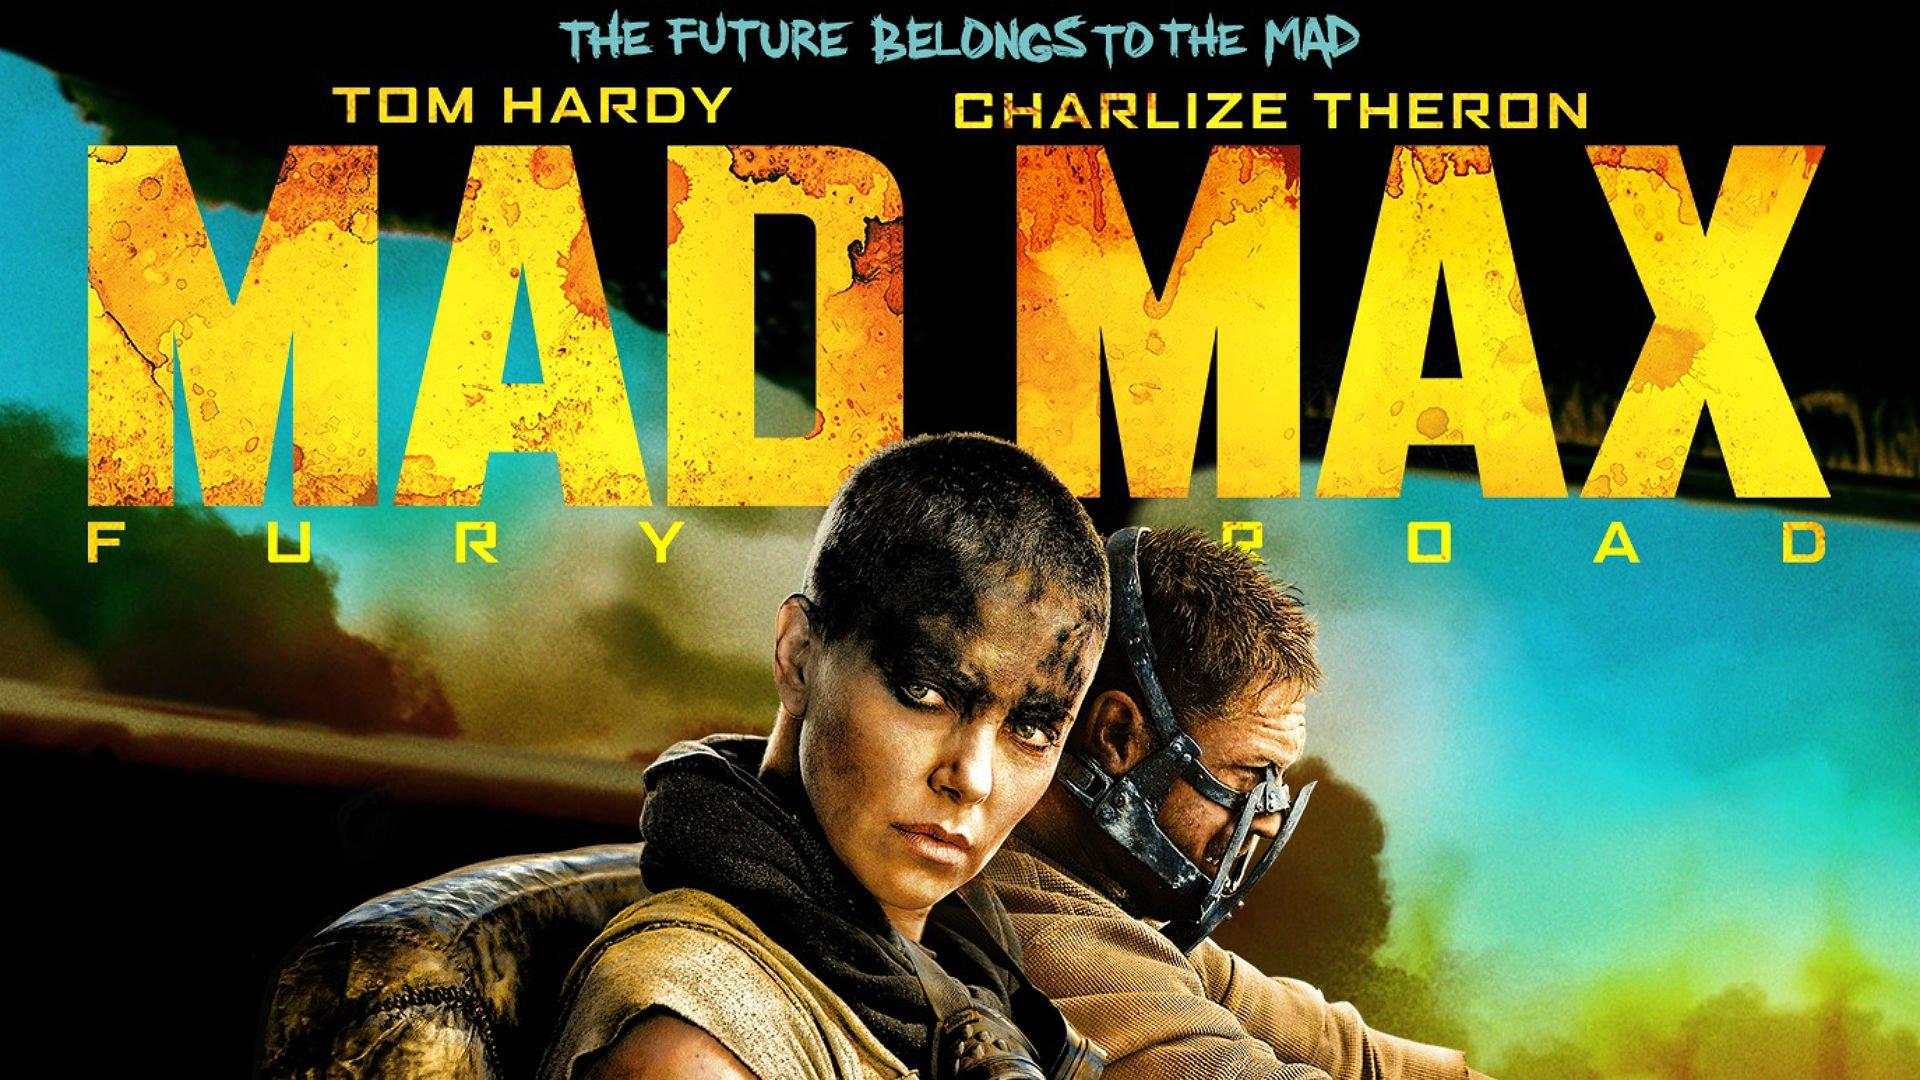 mad-max-fury-road-movie-posters.jpg